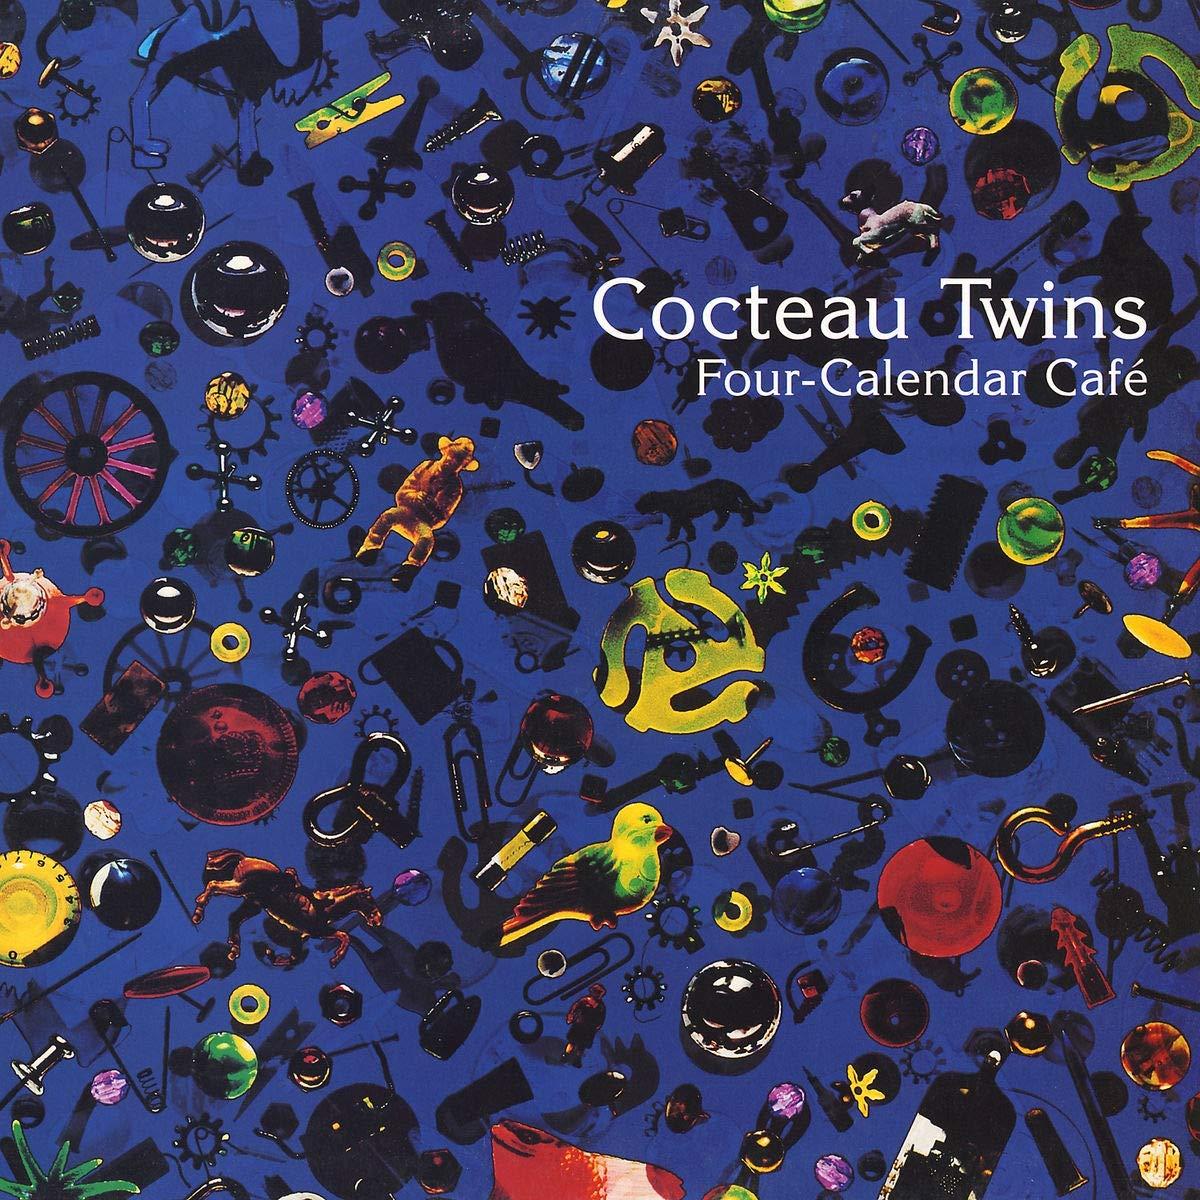 Cocteau Twins - Four Calendar Cafe [VINYL] now £9.99 (Prime) + £2.99 (non Prime) at Amazon